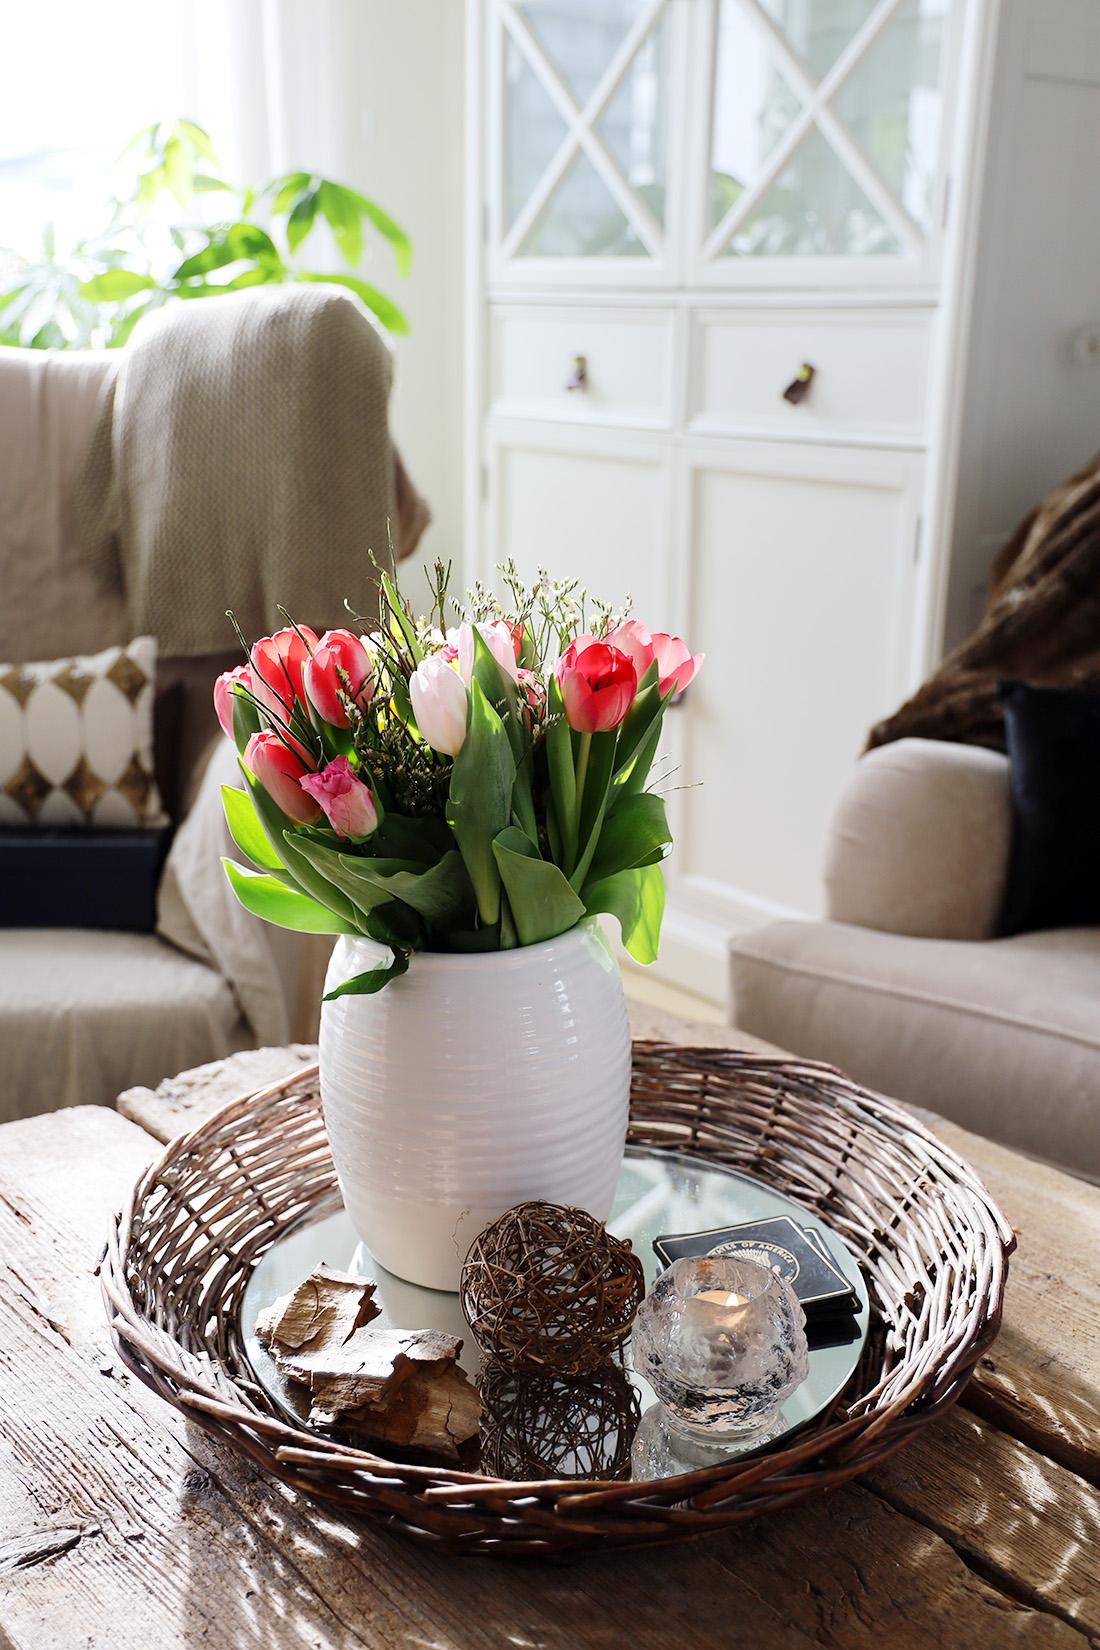 Romantik kan vara att köpa hem en blombukett